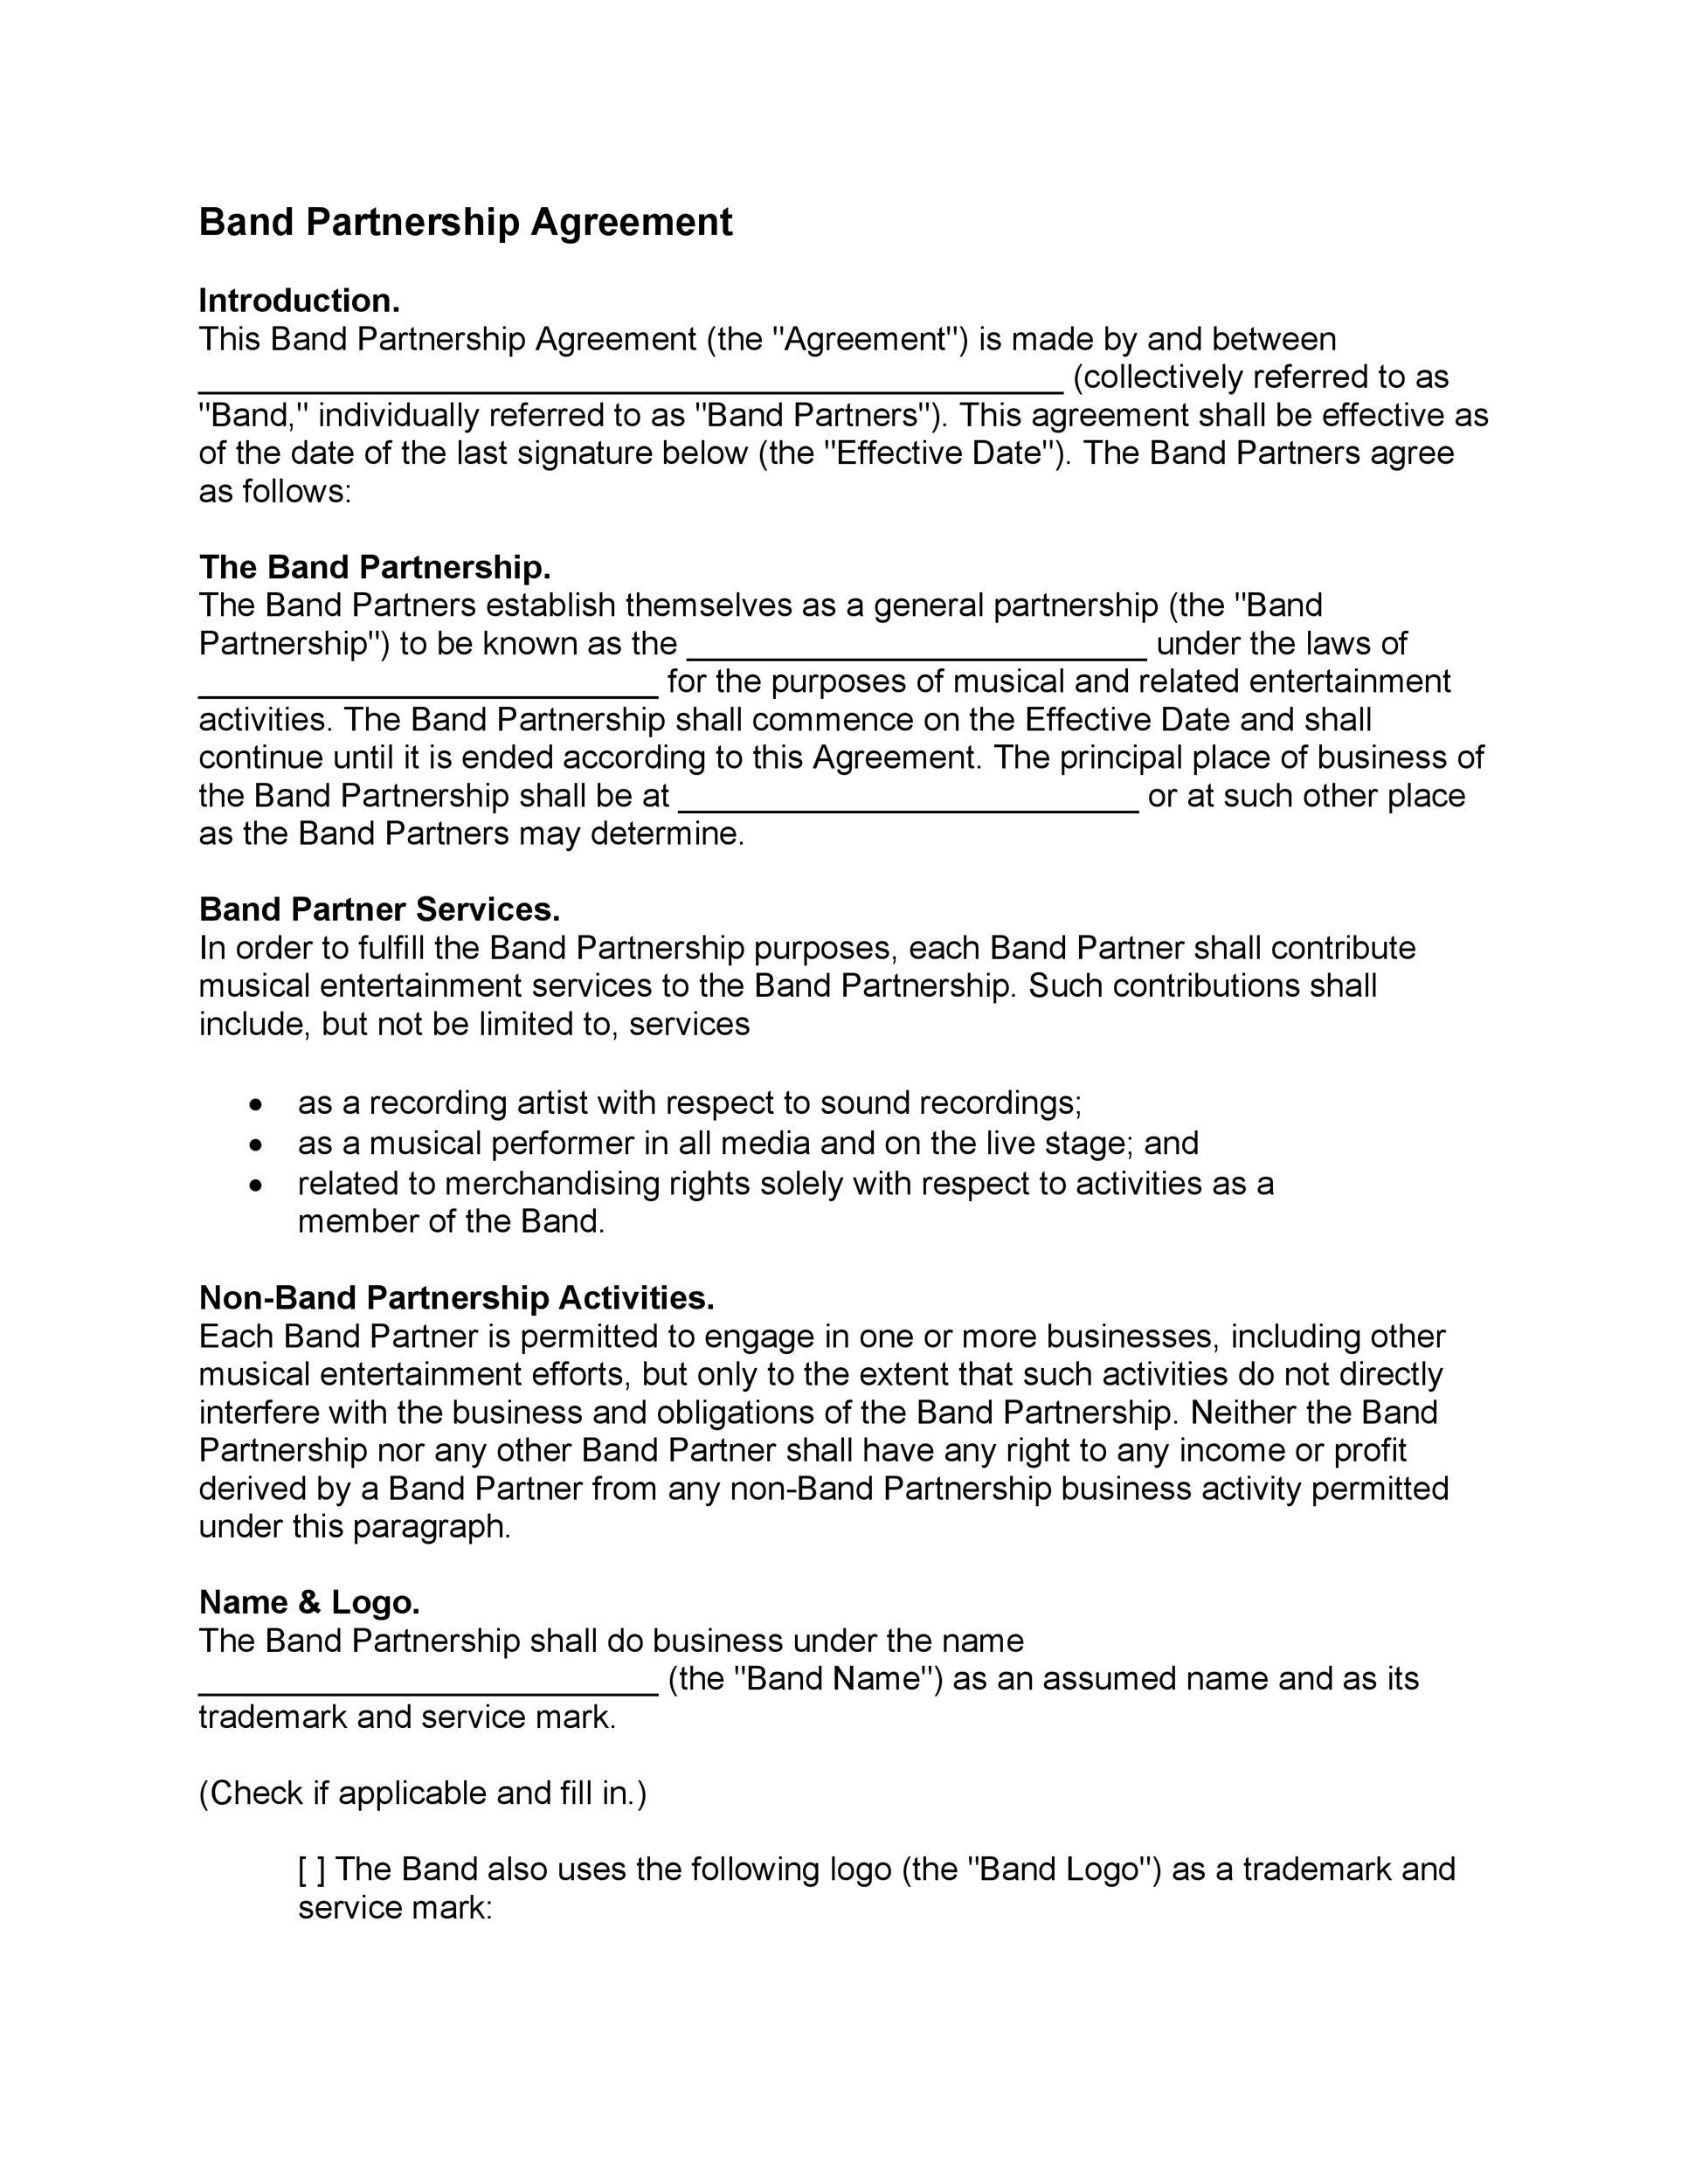 40+ FREE Partnership Agreement Templates (Business, General) - partenership agreement